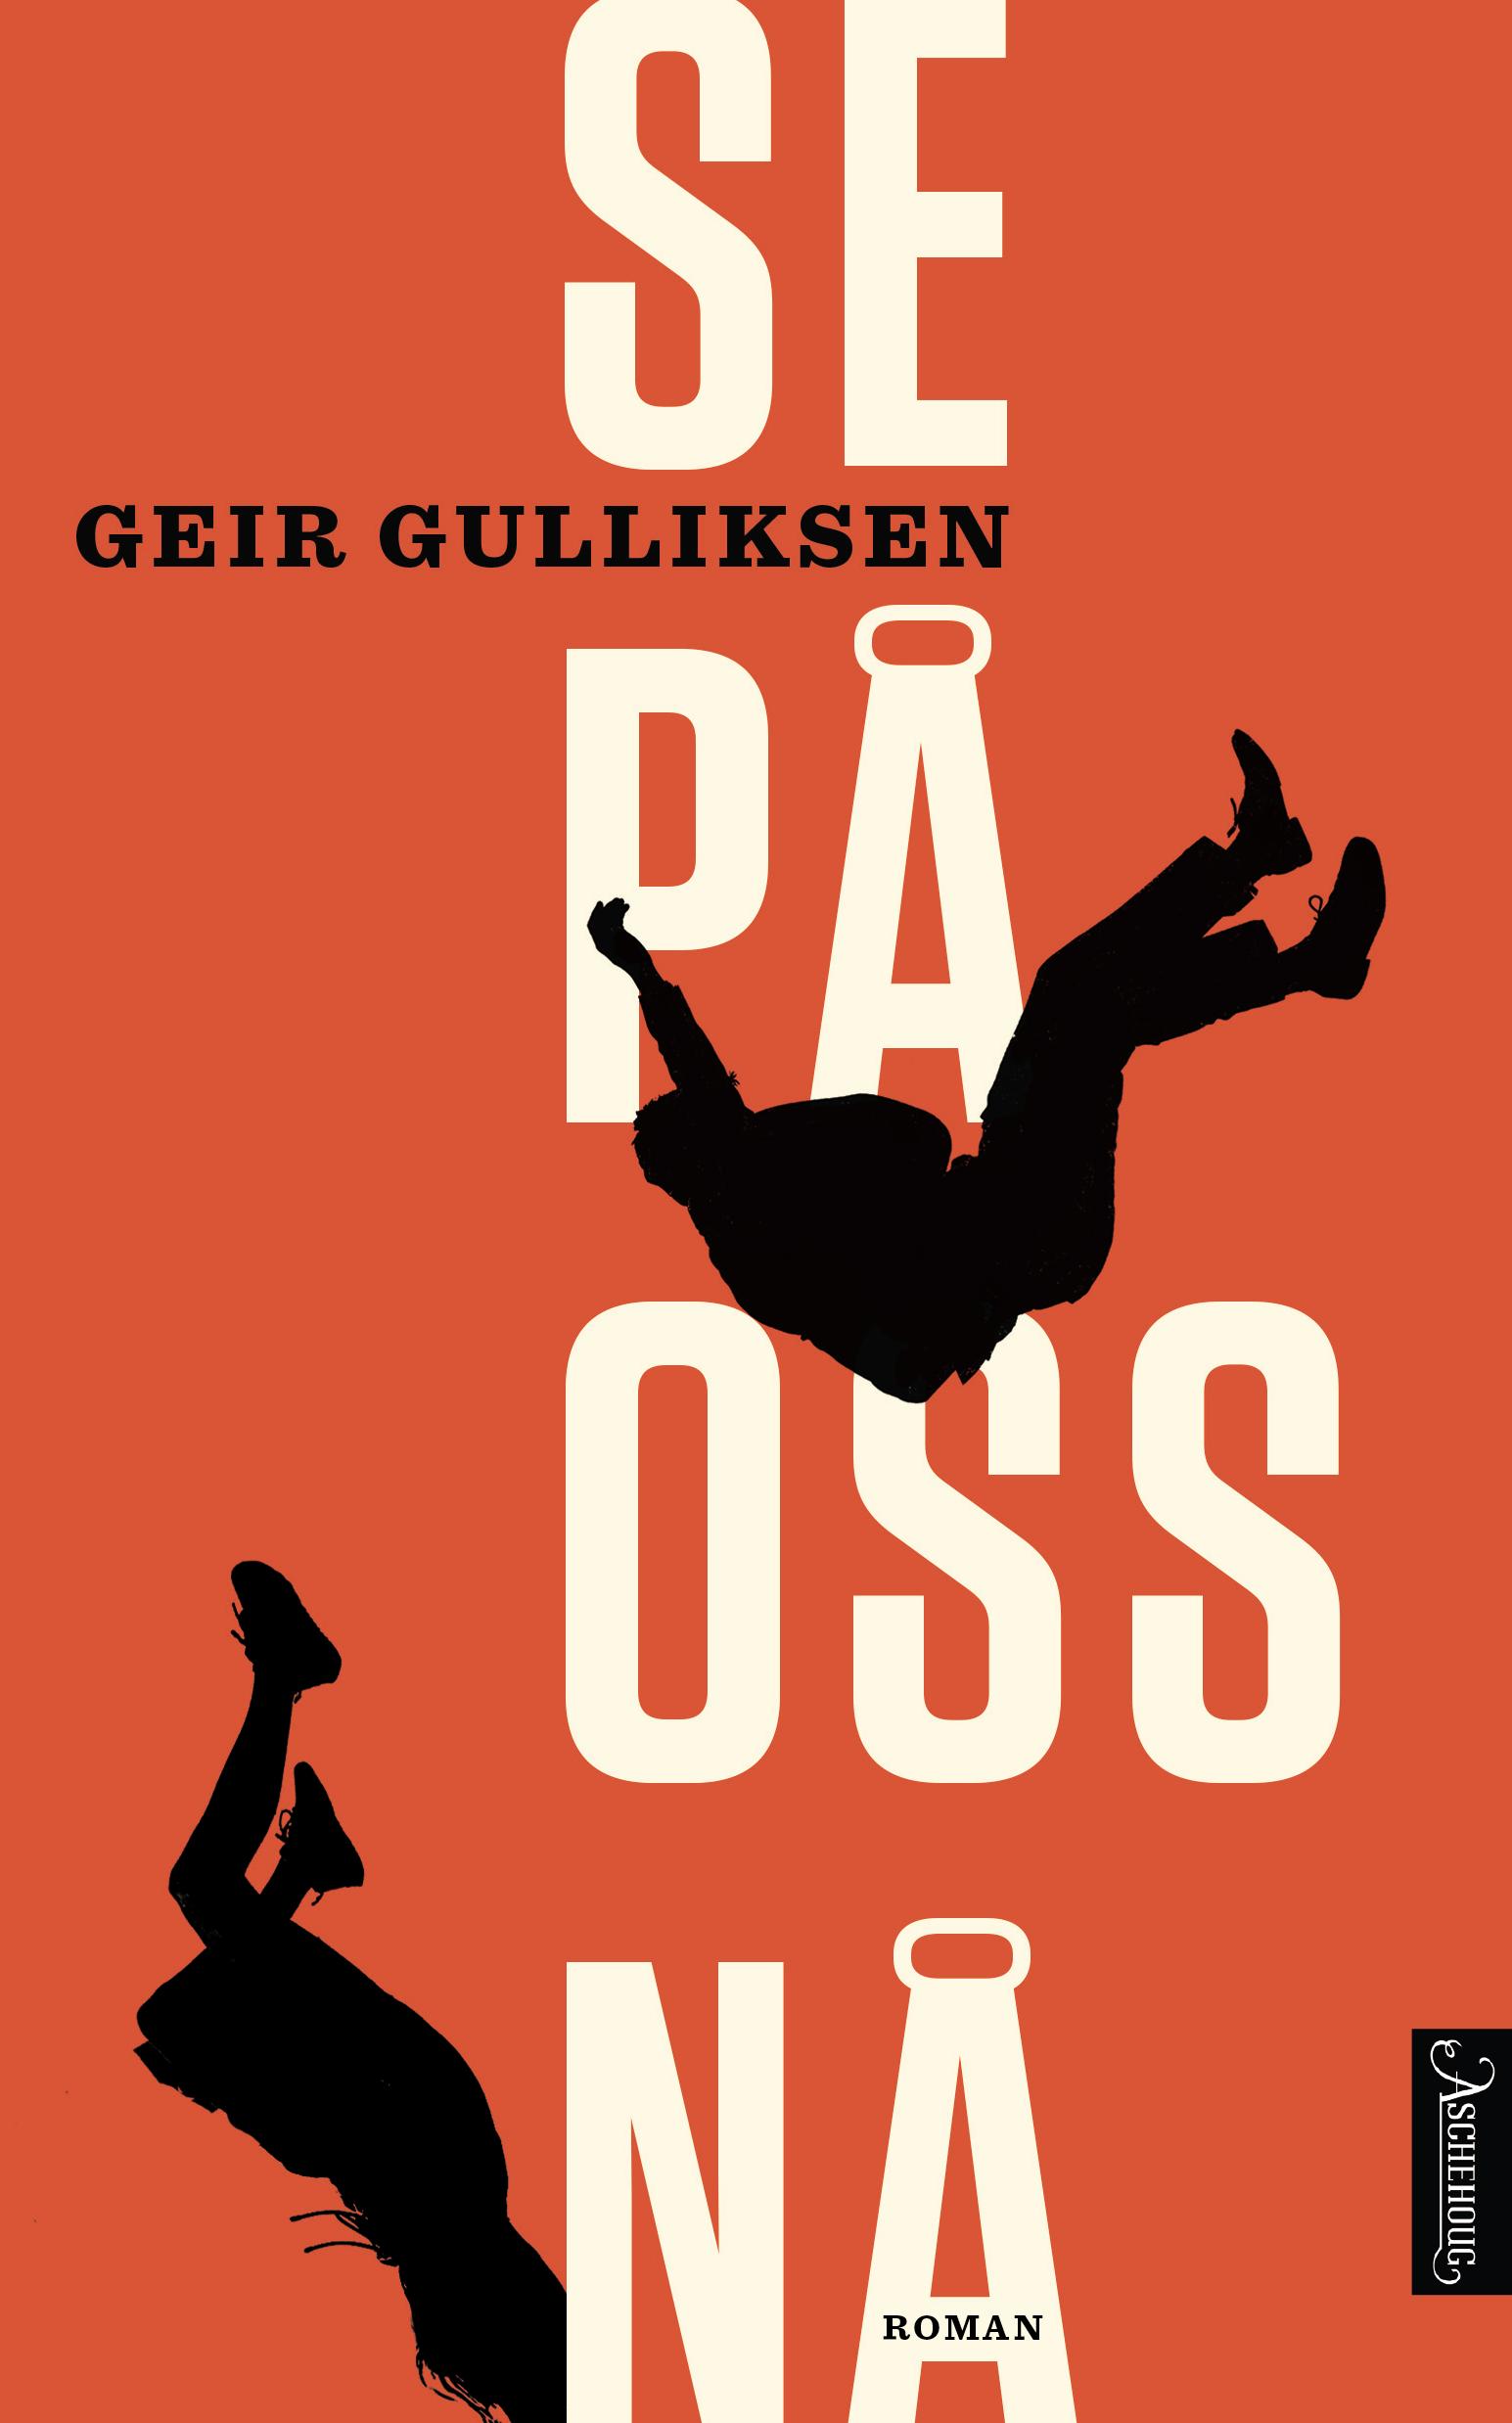 New Gulliksen!